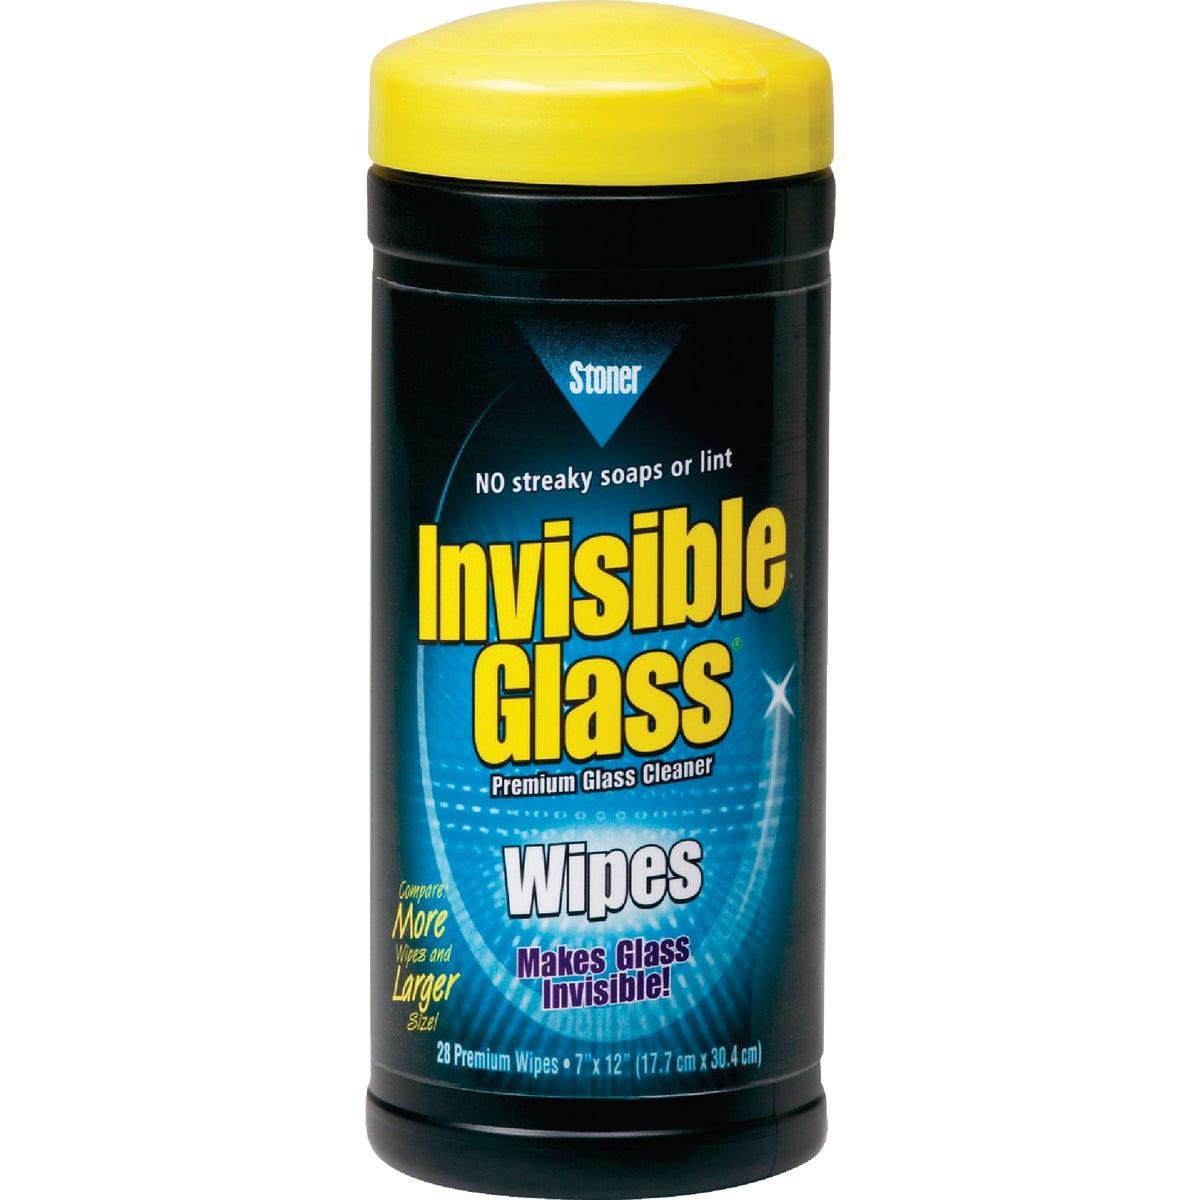 28Ct Glass Wipes